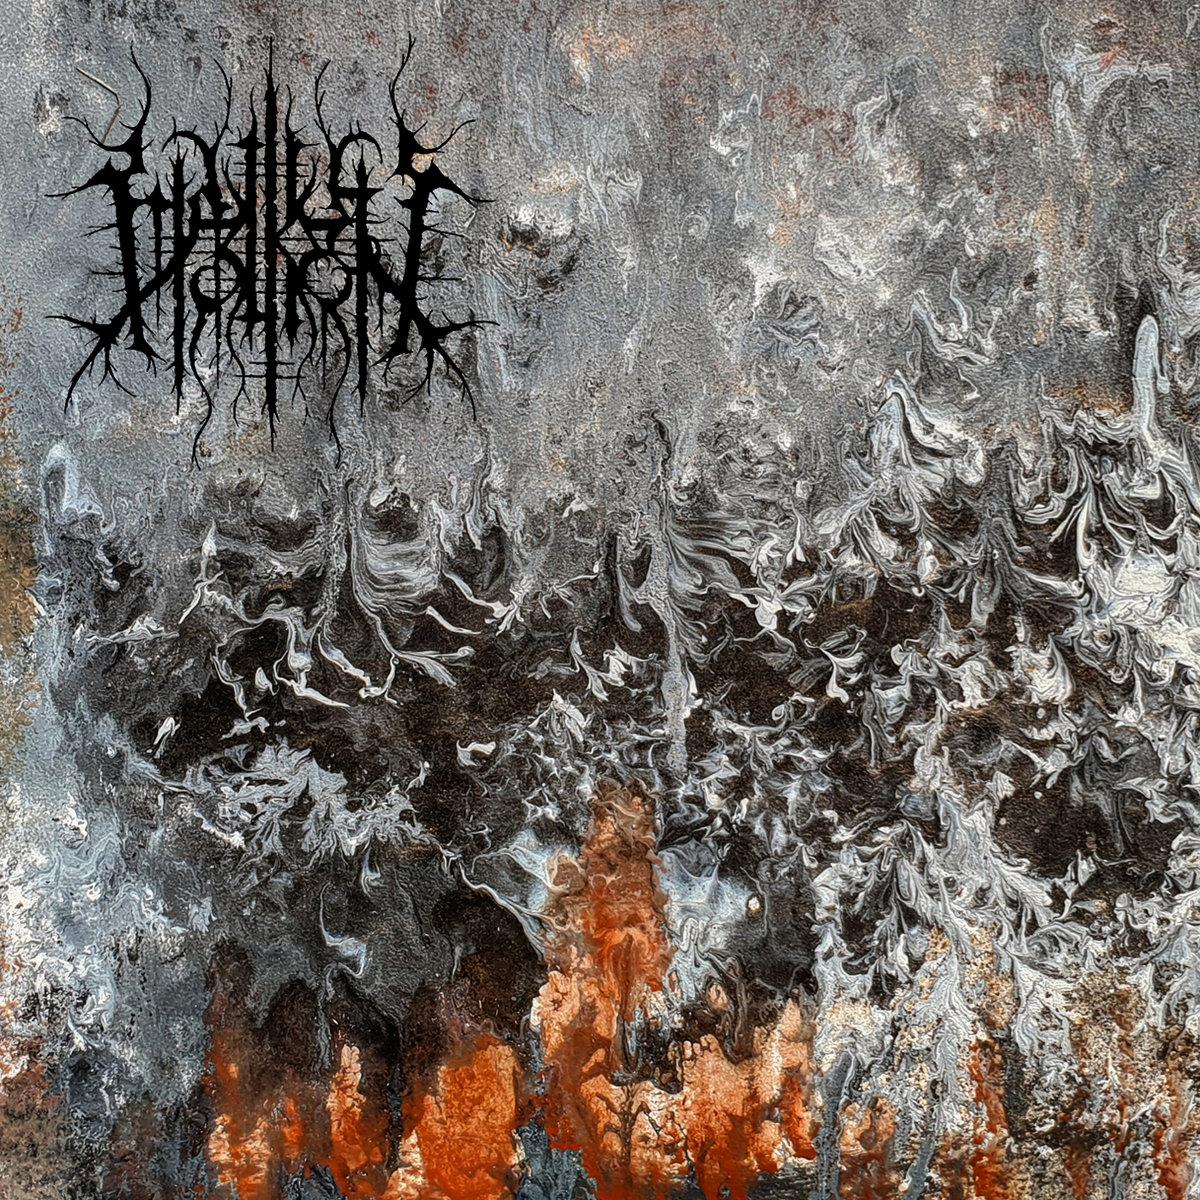 Mazikeen – Psychotic Reign (Fragment)